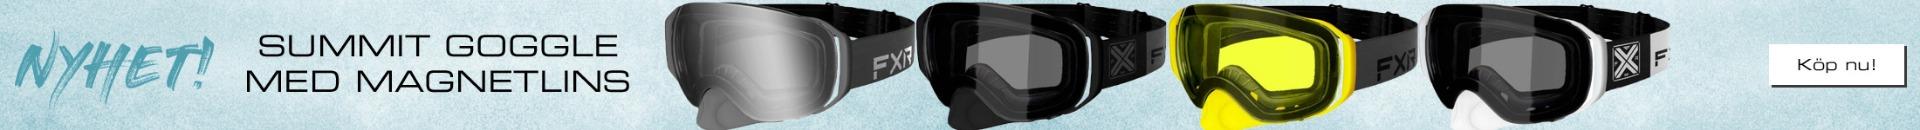 FXR Shoppen - FXR Summit skoterglasögon med magnetisk lins